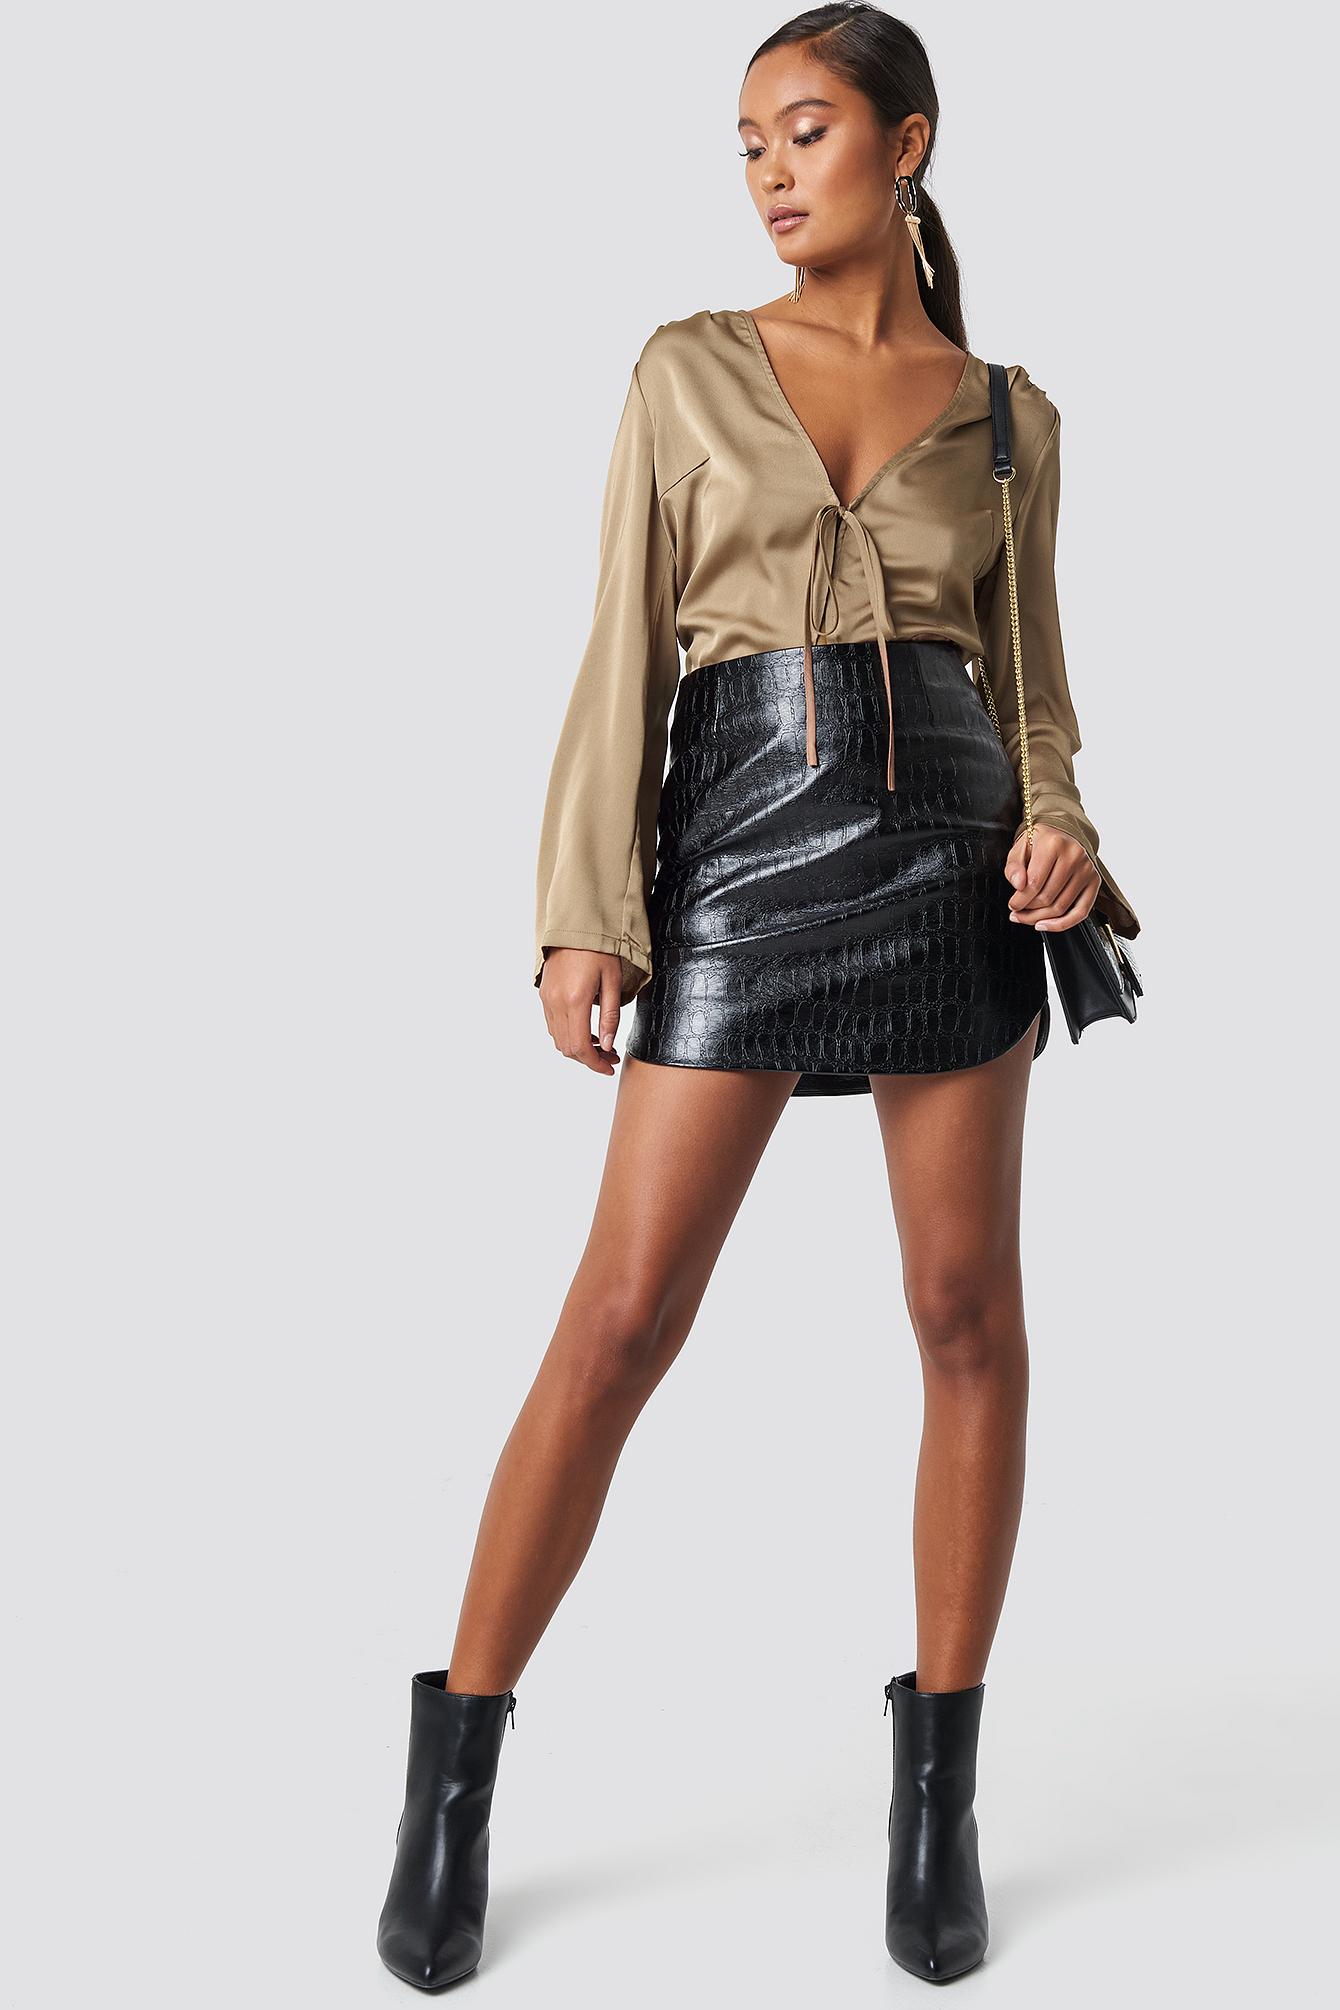 Sydney Skirt NA-KD.COM